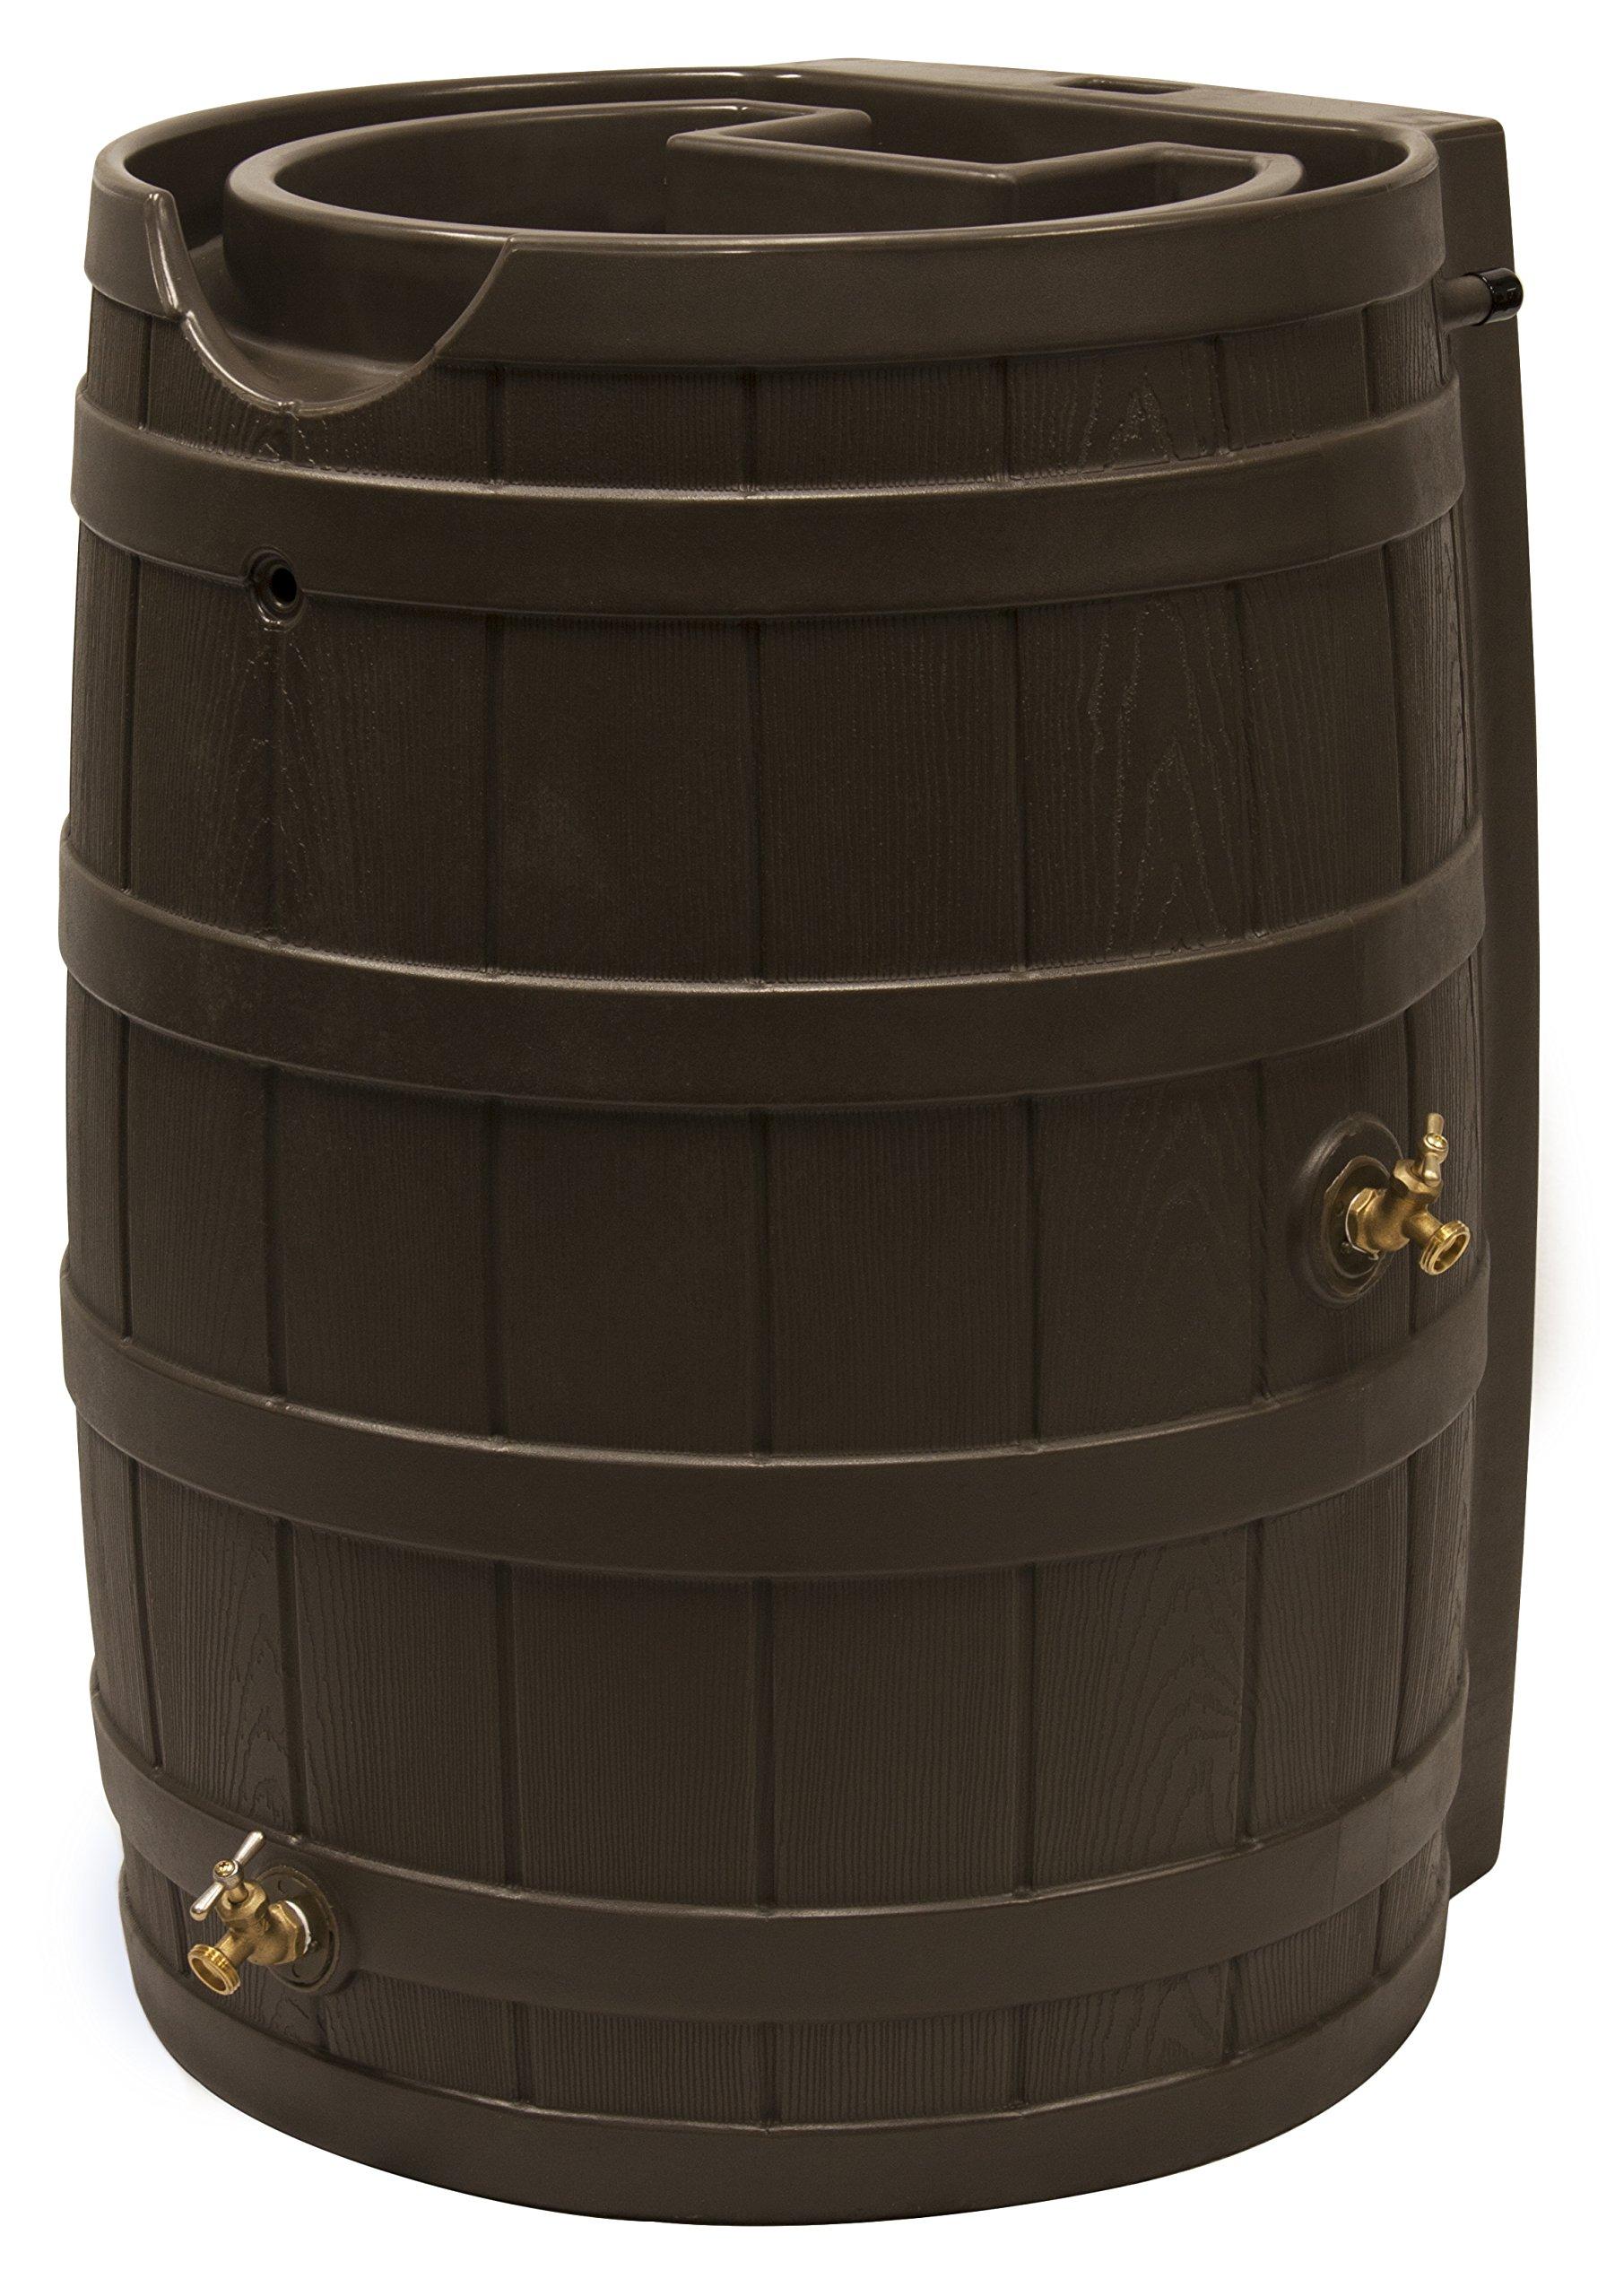 Good Ideas RW65-OAK Rain Wizard Rain Barrel, 65 gallon, Oak by Good Ideas